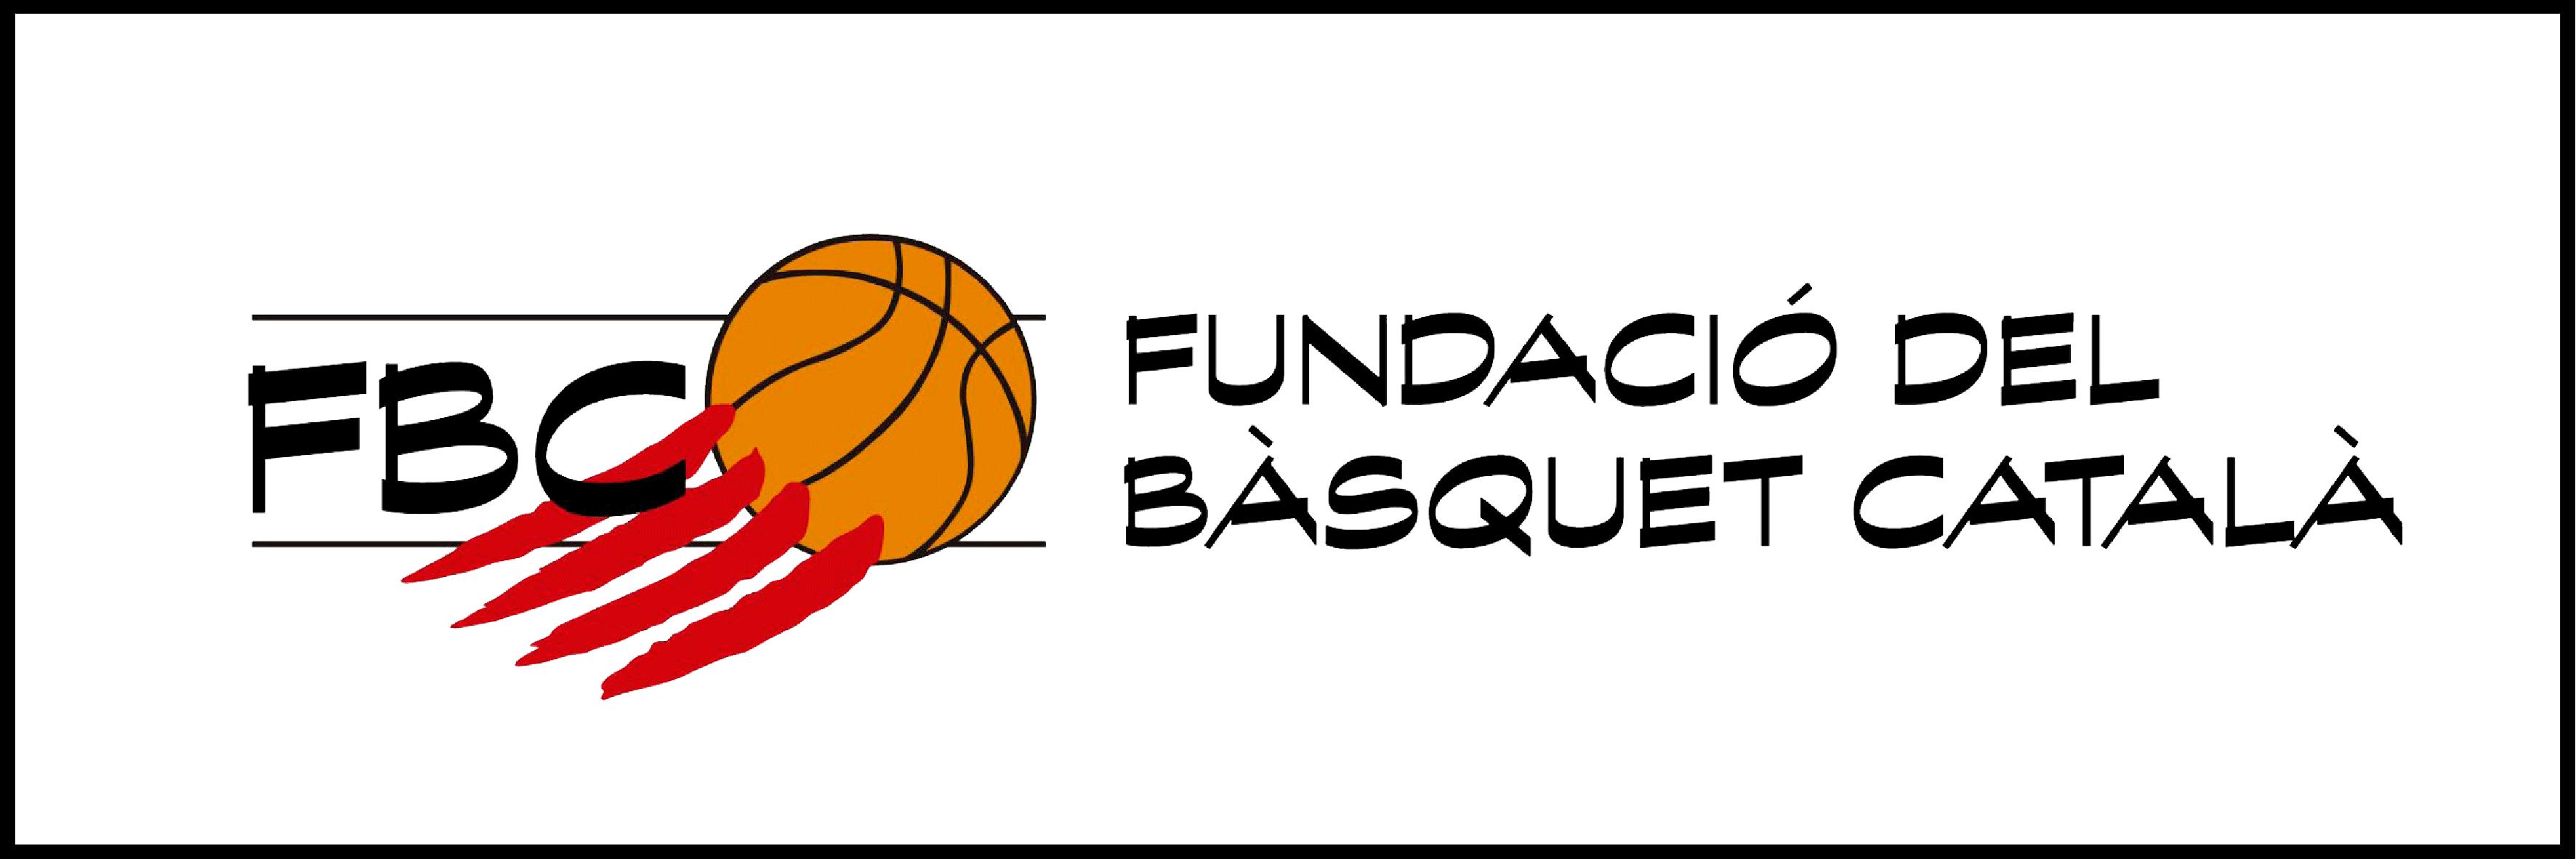 http://tcloenda.basquetcatala.cat/wp-content/uploads/2016/04/FBCtorneig.png